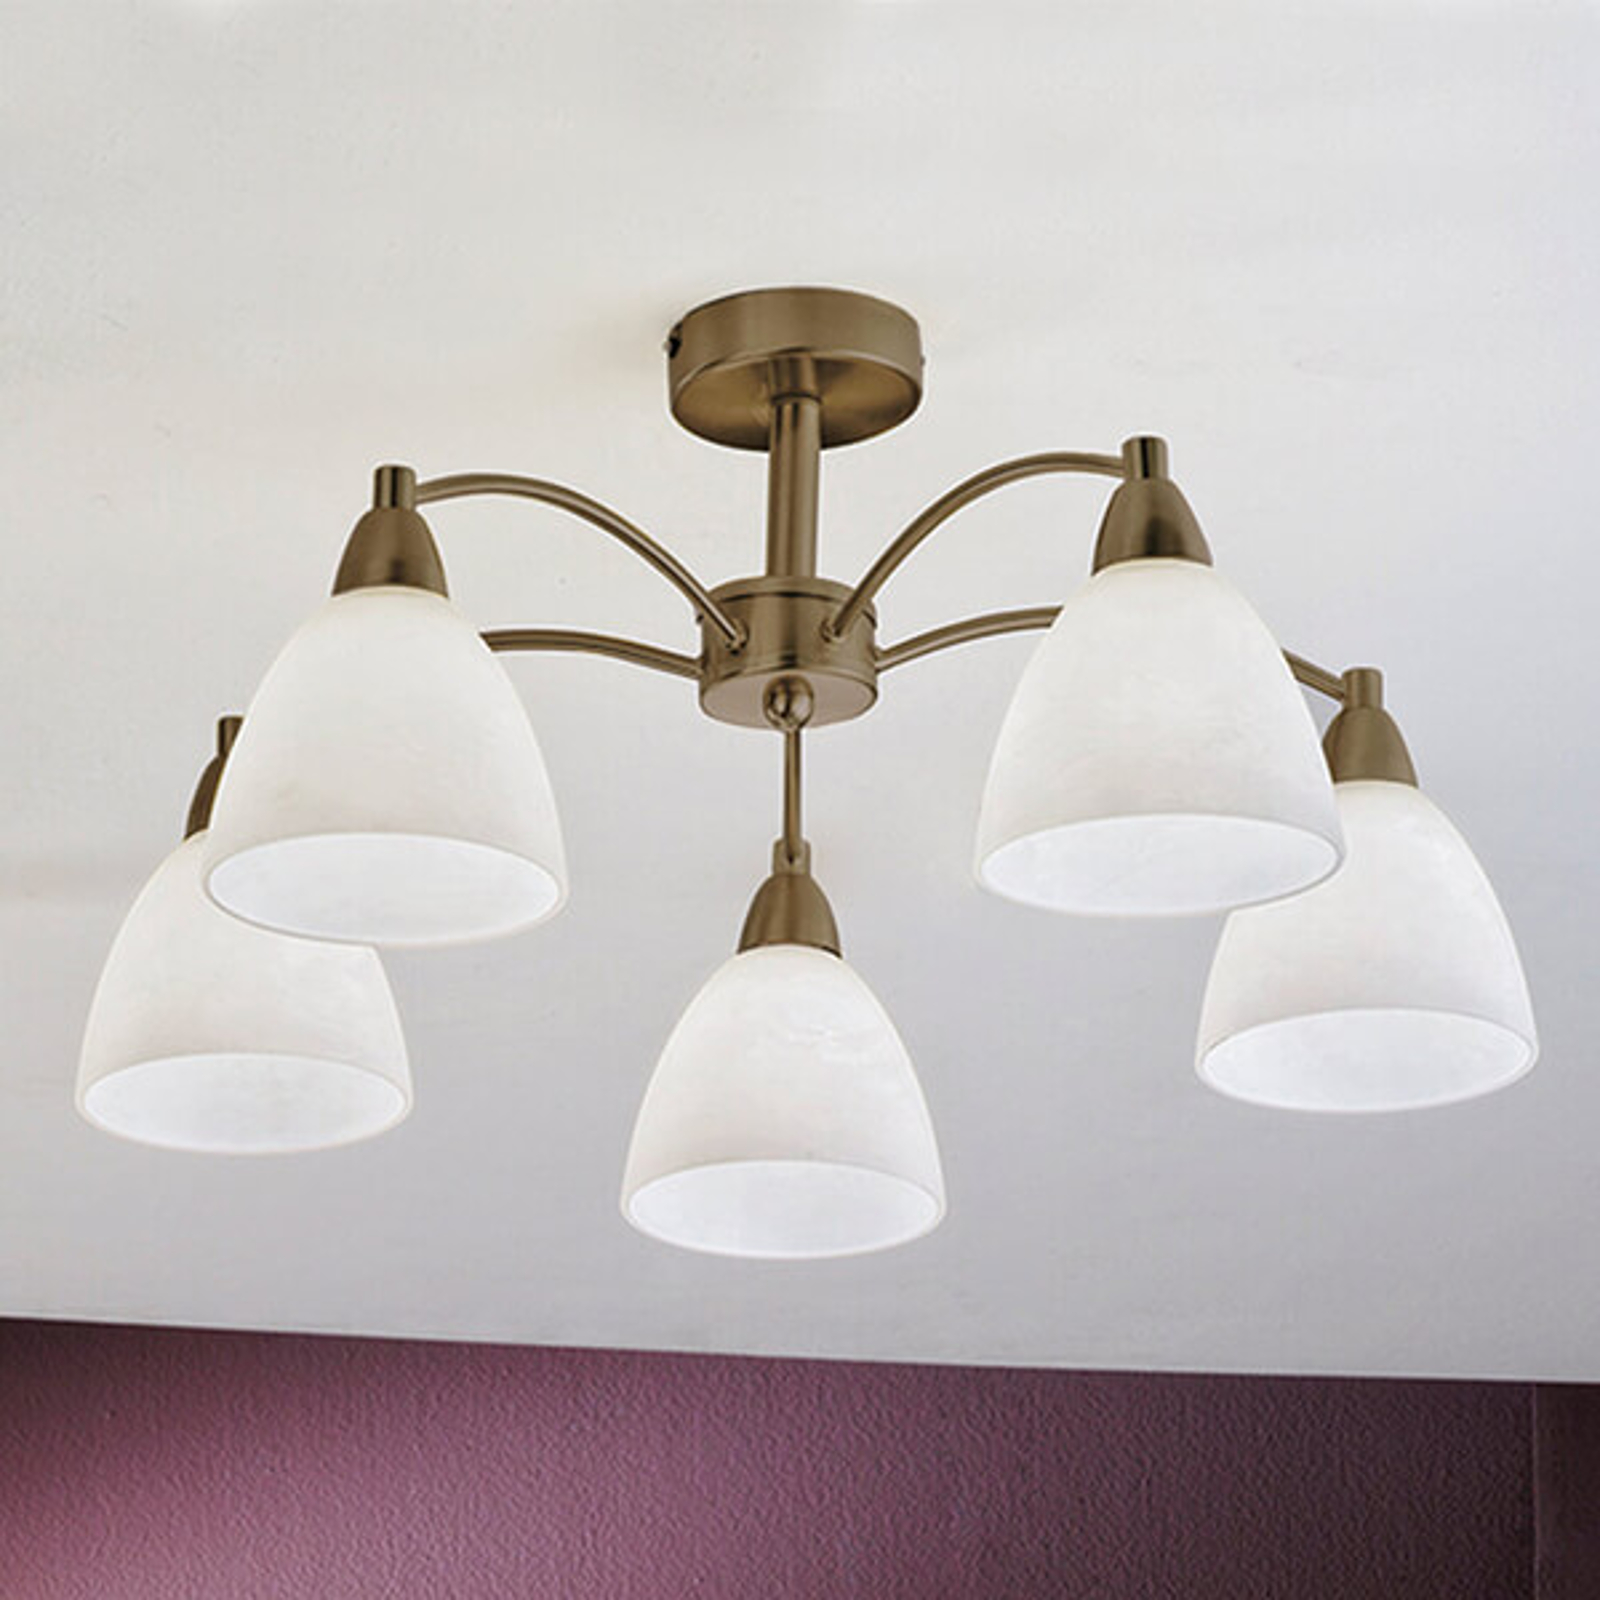 Deckenlampe Kinga, altmessing, 5-flammig